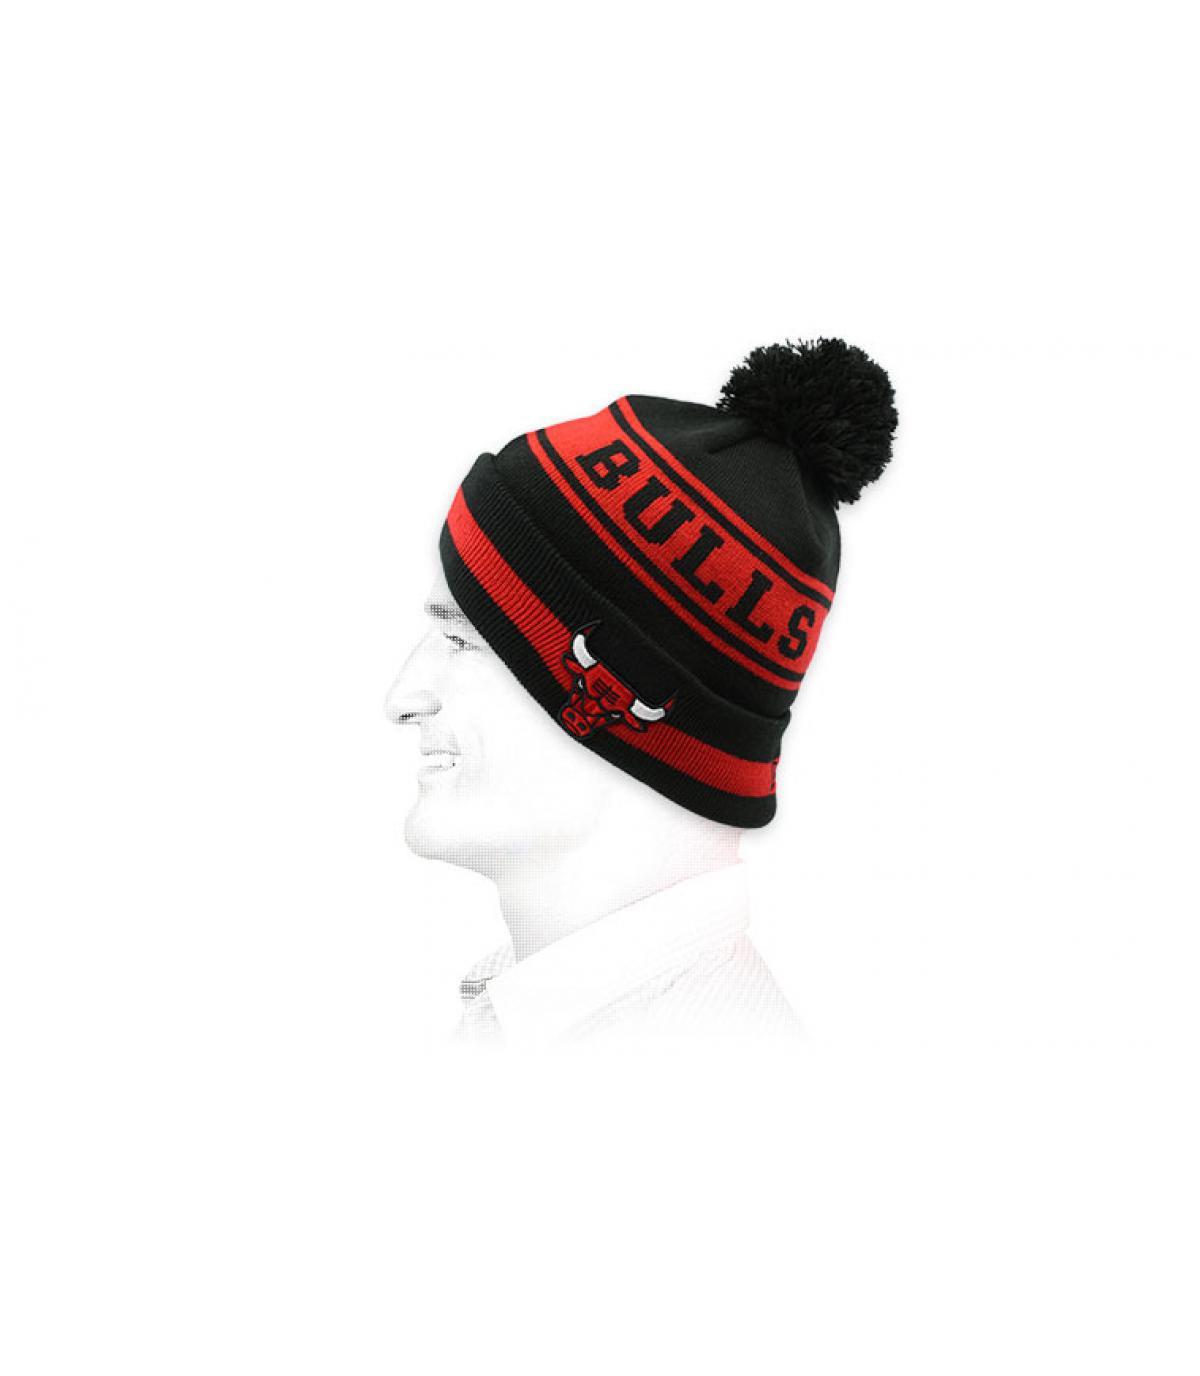 Mütze Bulls schwarz rot